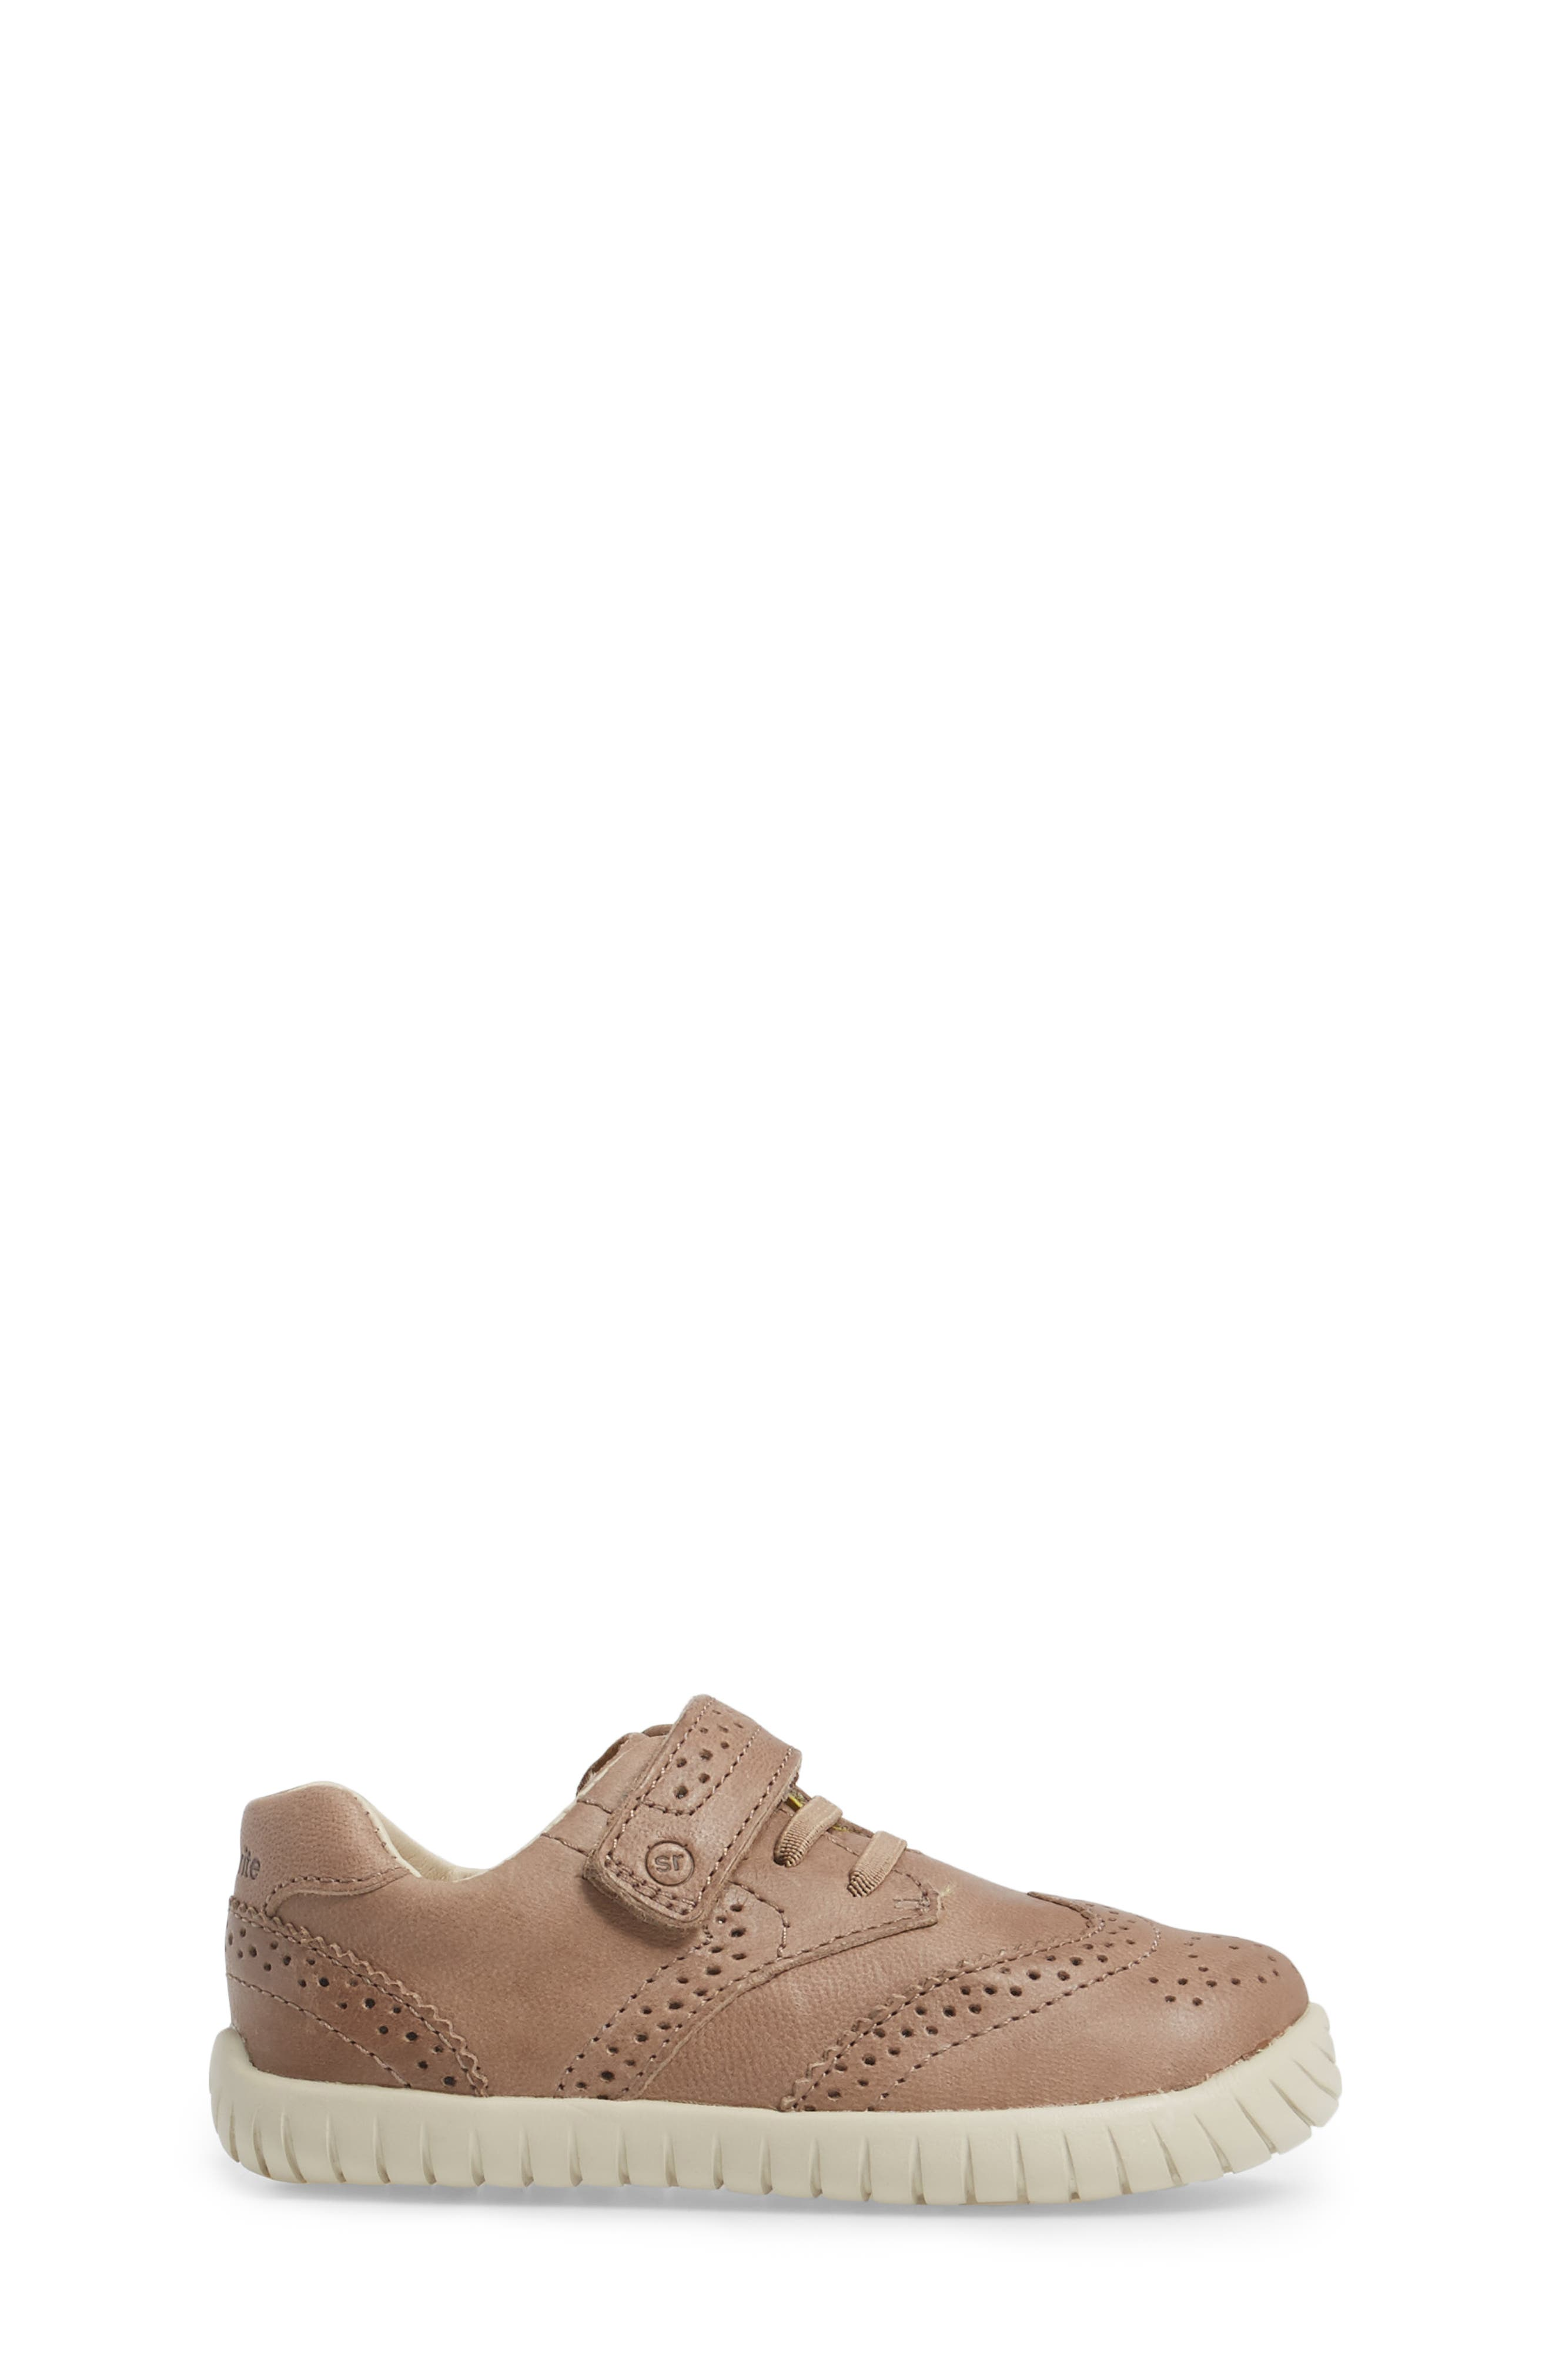 Addison Wingtip Sneaker,                             Alternate thumbnail 3, color,                             Brown